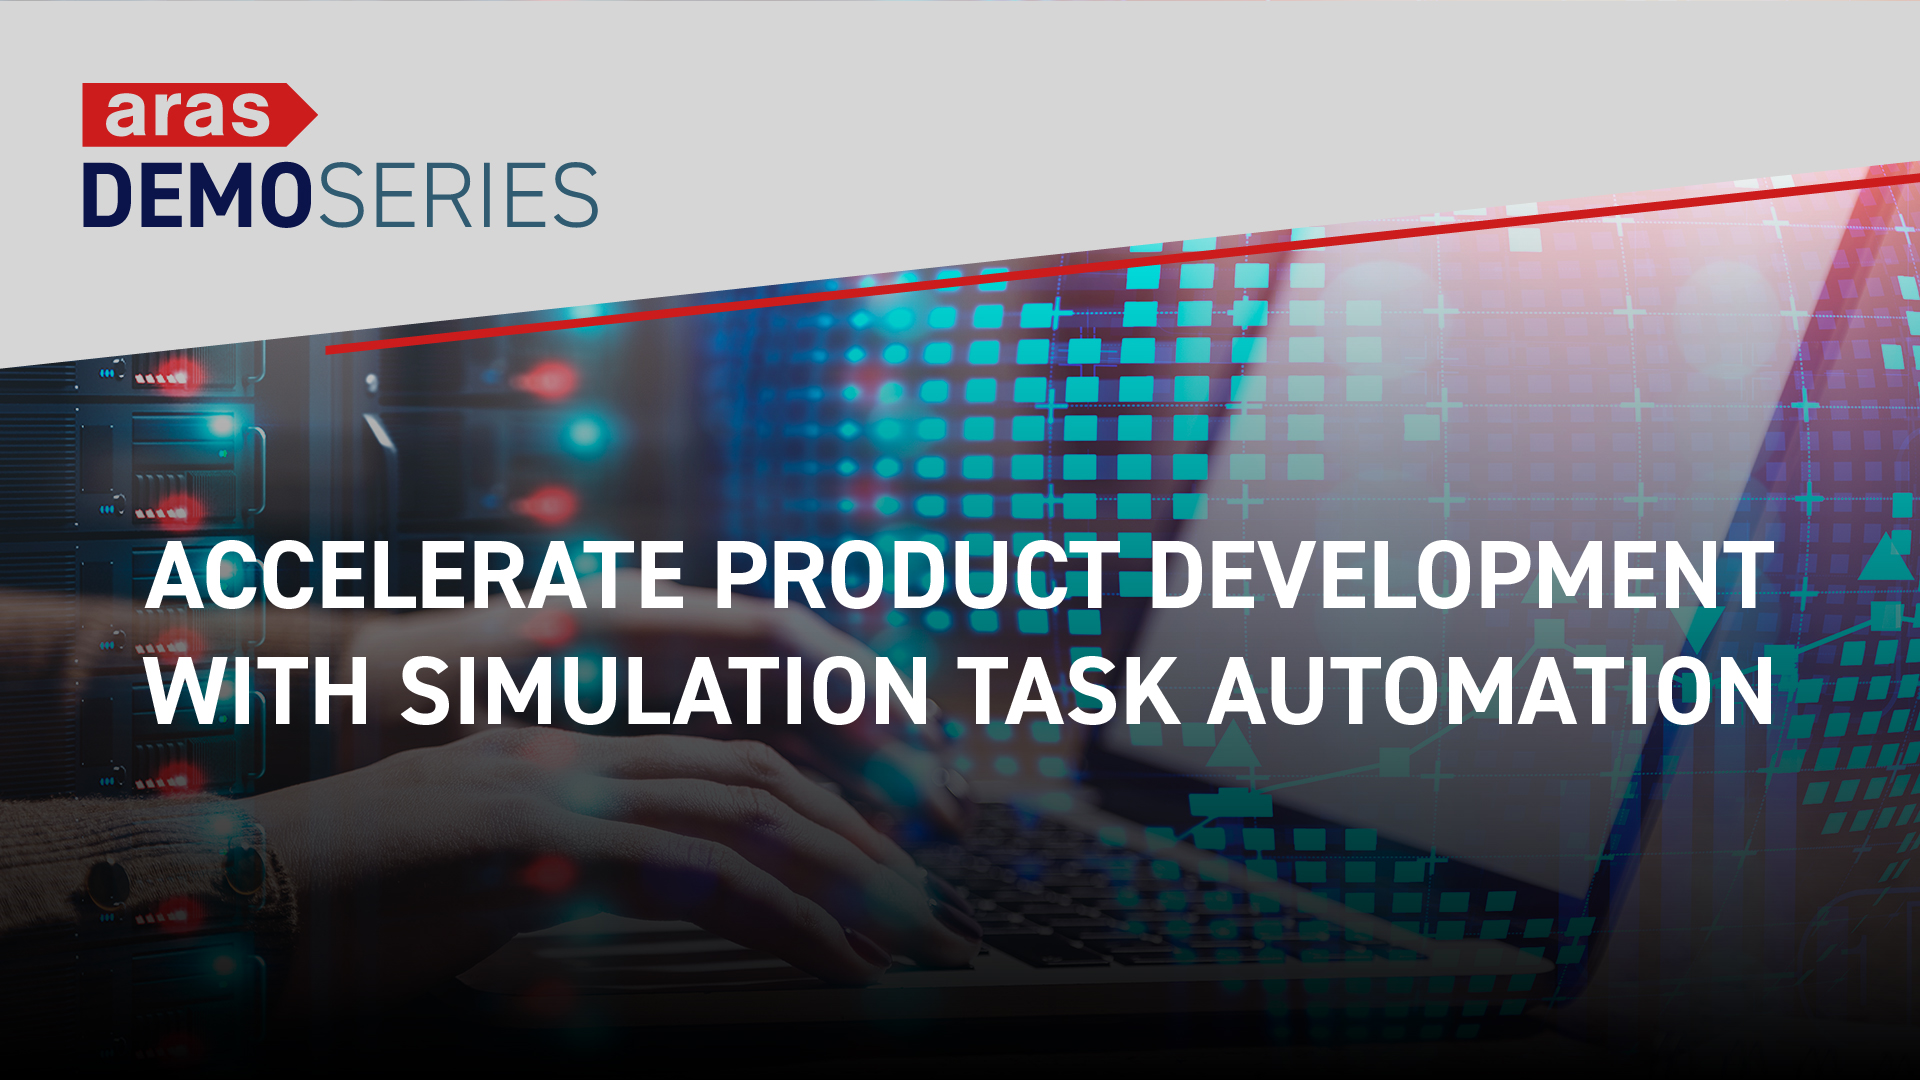 Simulation Task Automation